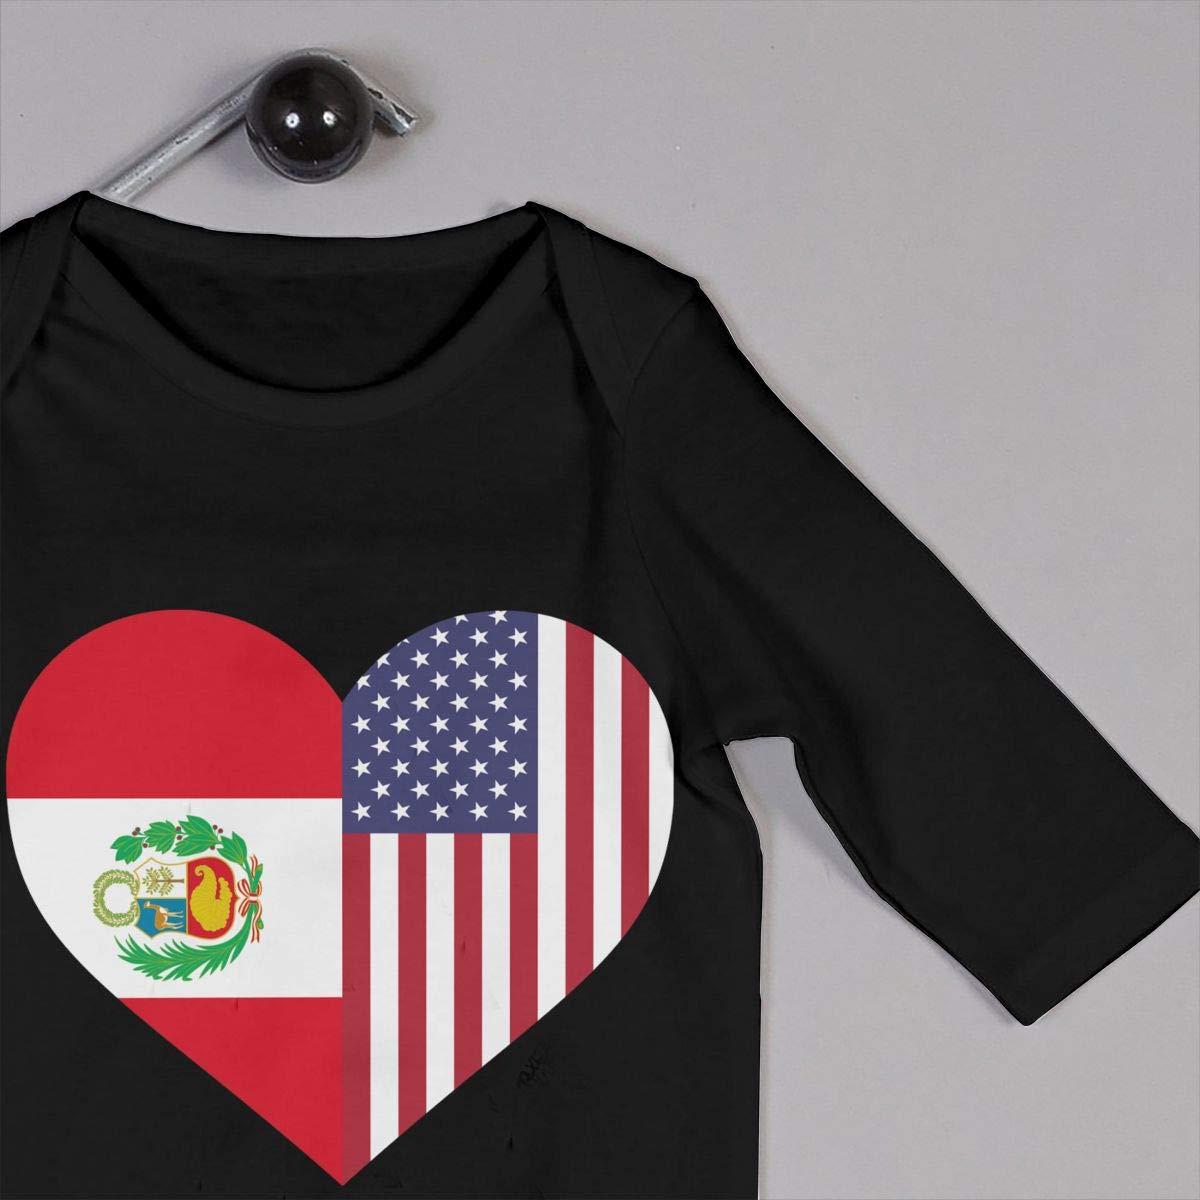 LBJQ8 Peru Flag Half America Flag Half Heart Shaped Baby Infant Girls Soft /& Breathable Bodysuit Sleepwear